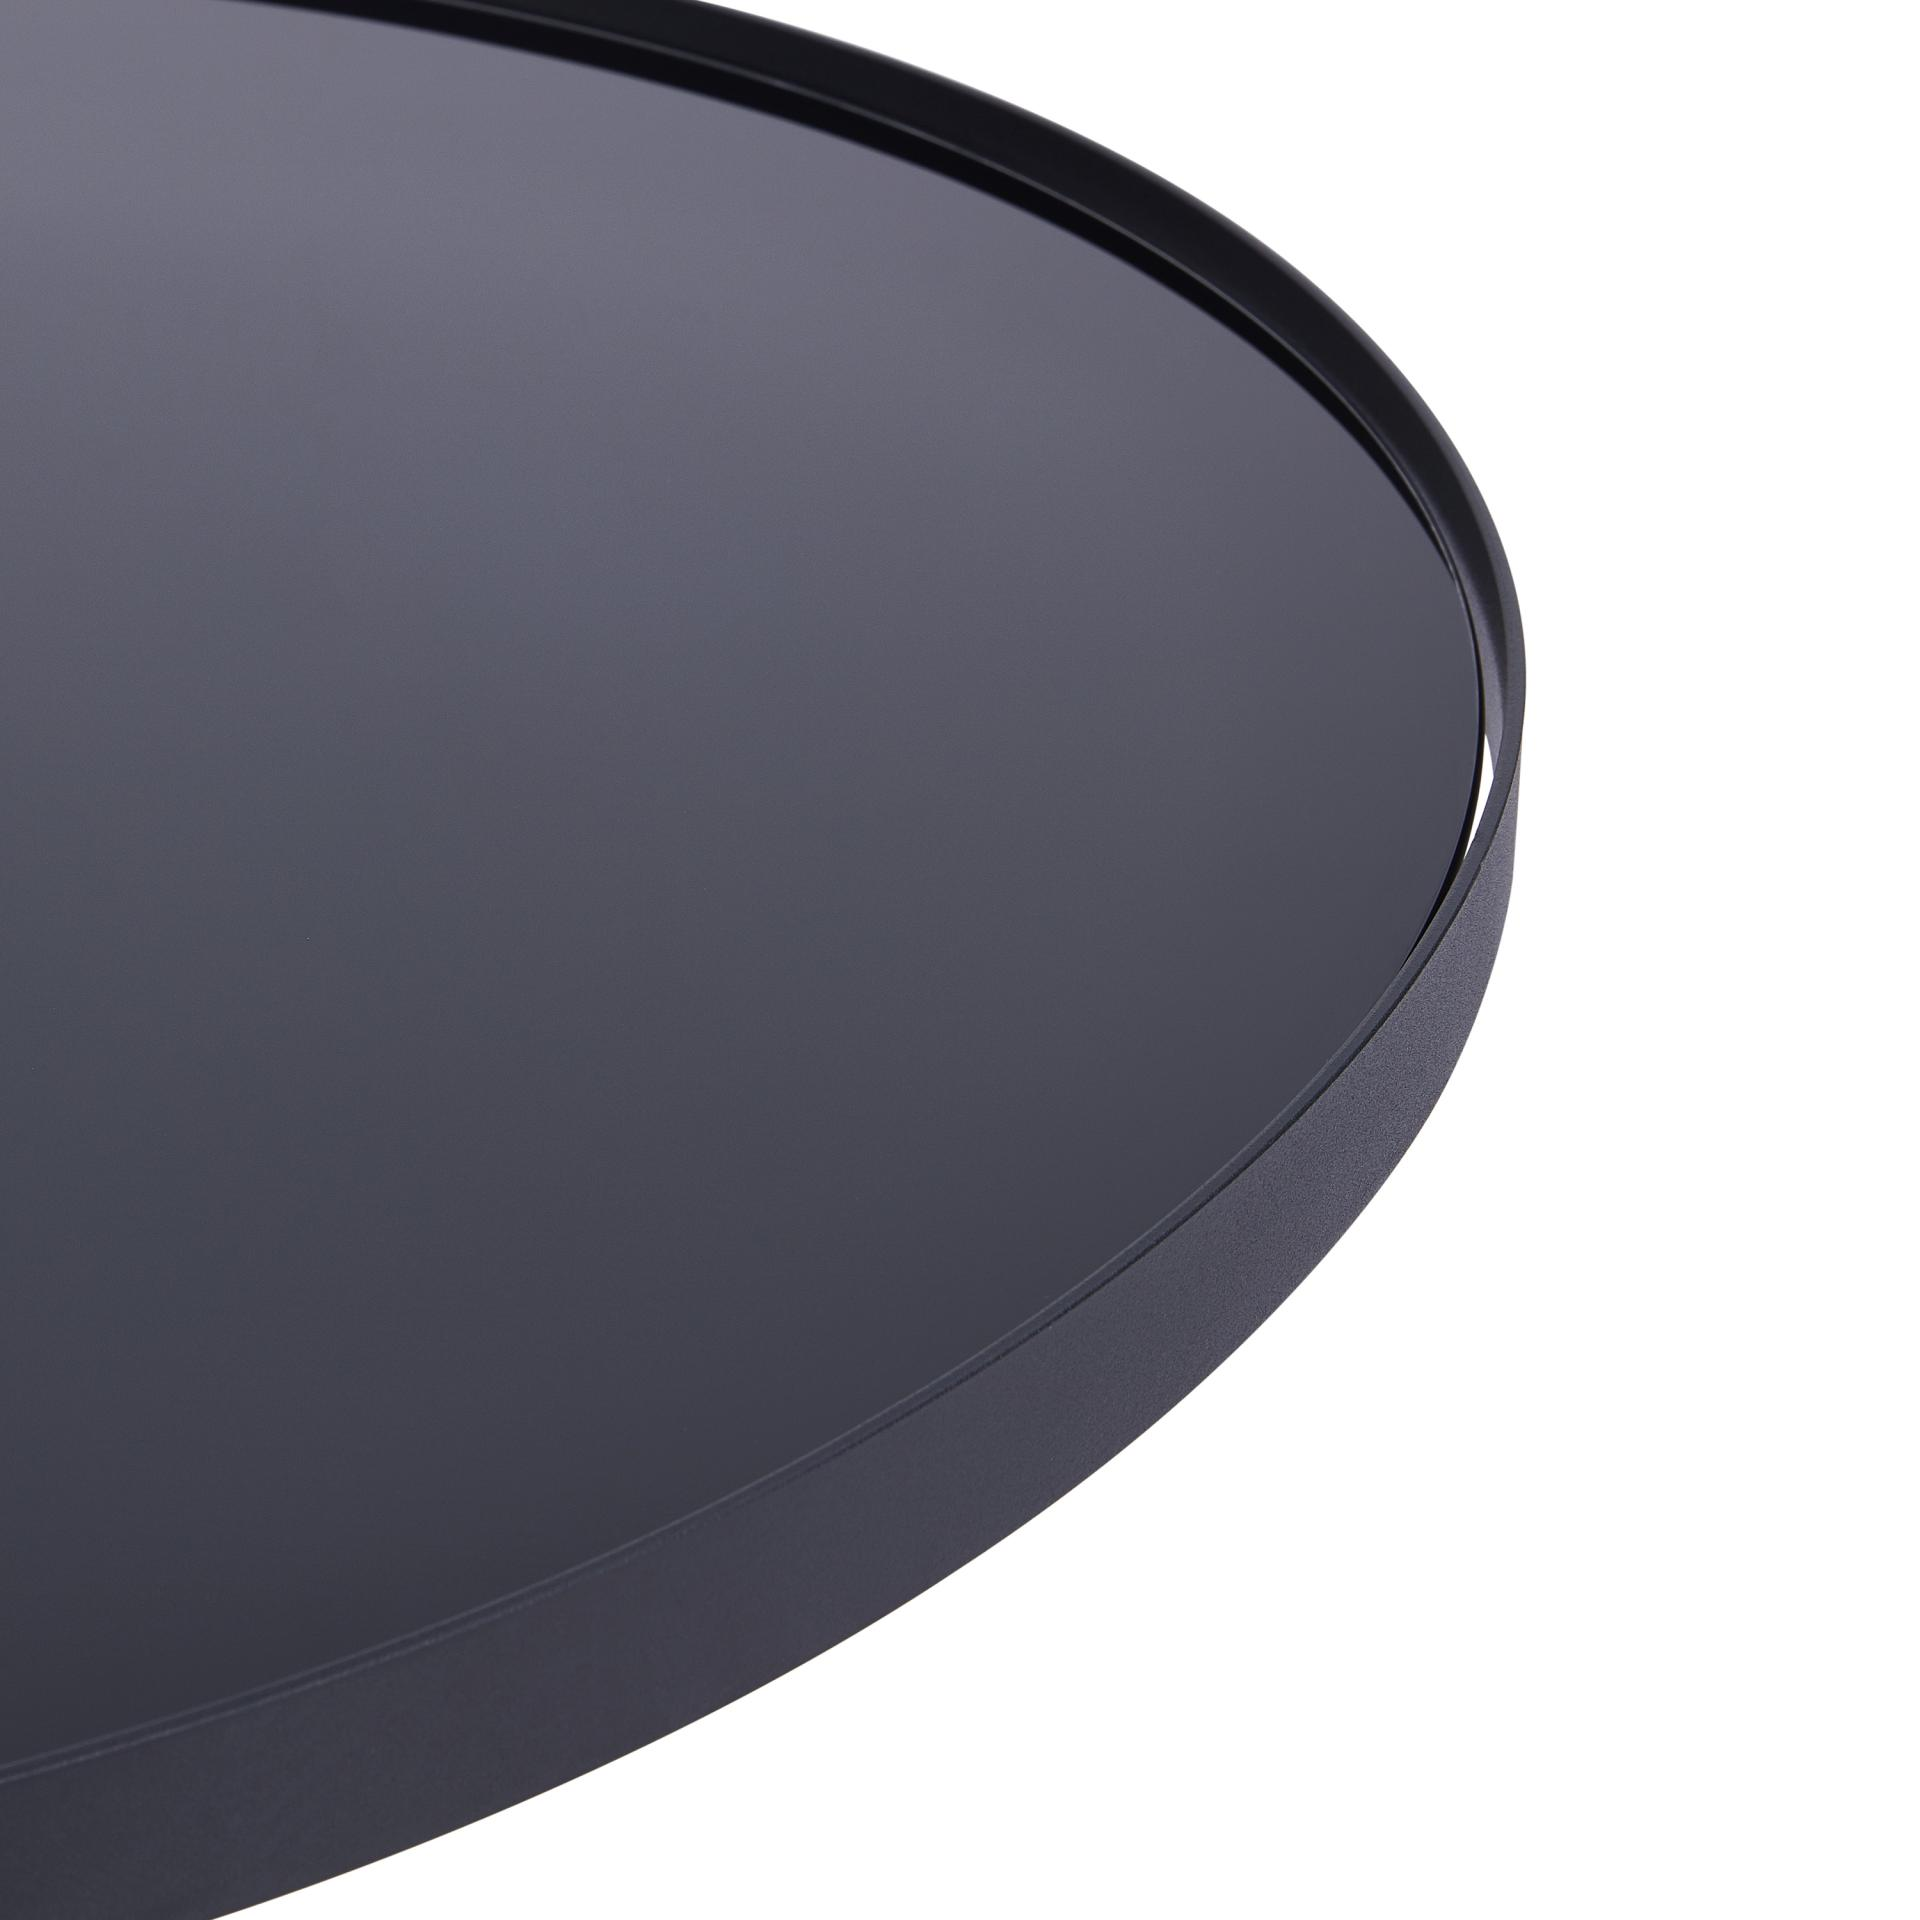 3pc Black Temper Glass Tops Metal Legs Coffee Table W: Wholesale Lifestyle Furnishings